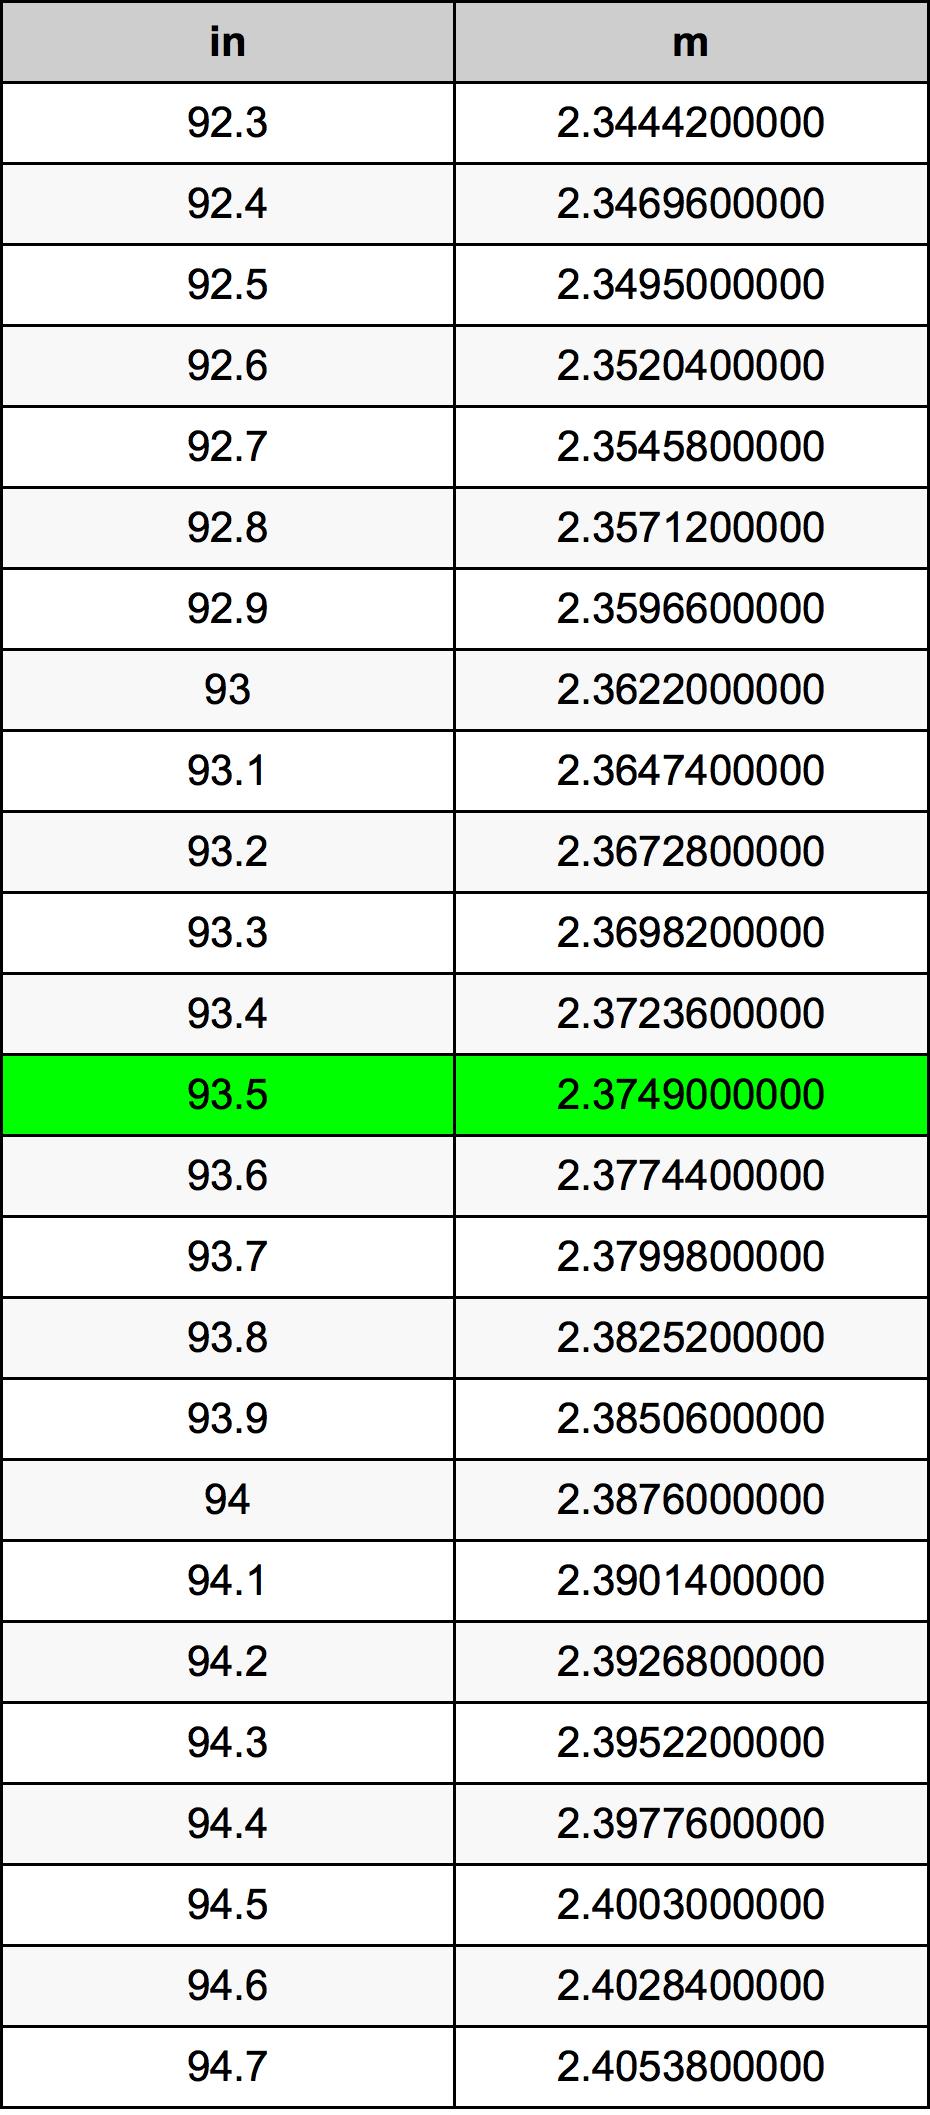 93.5 Inch konverteringstabell